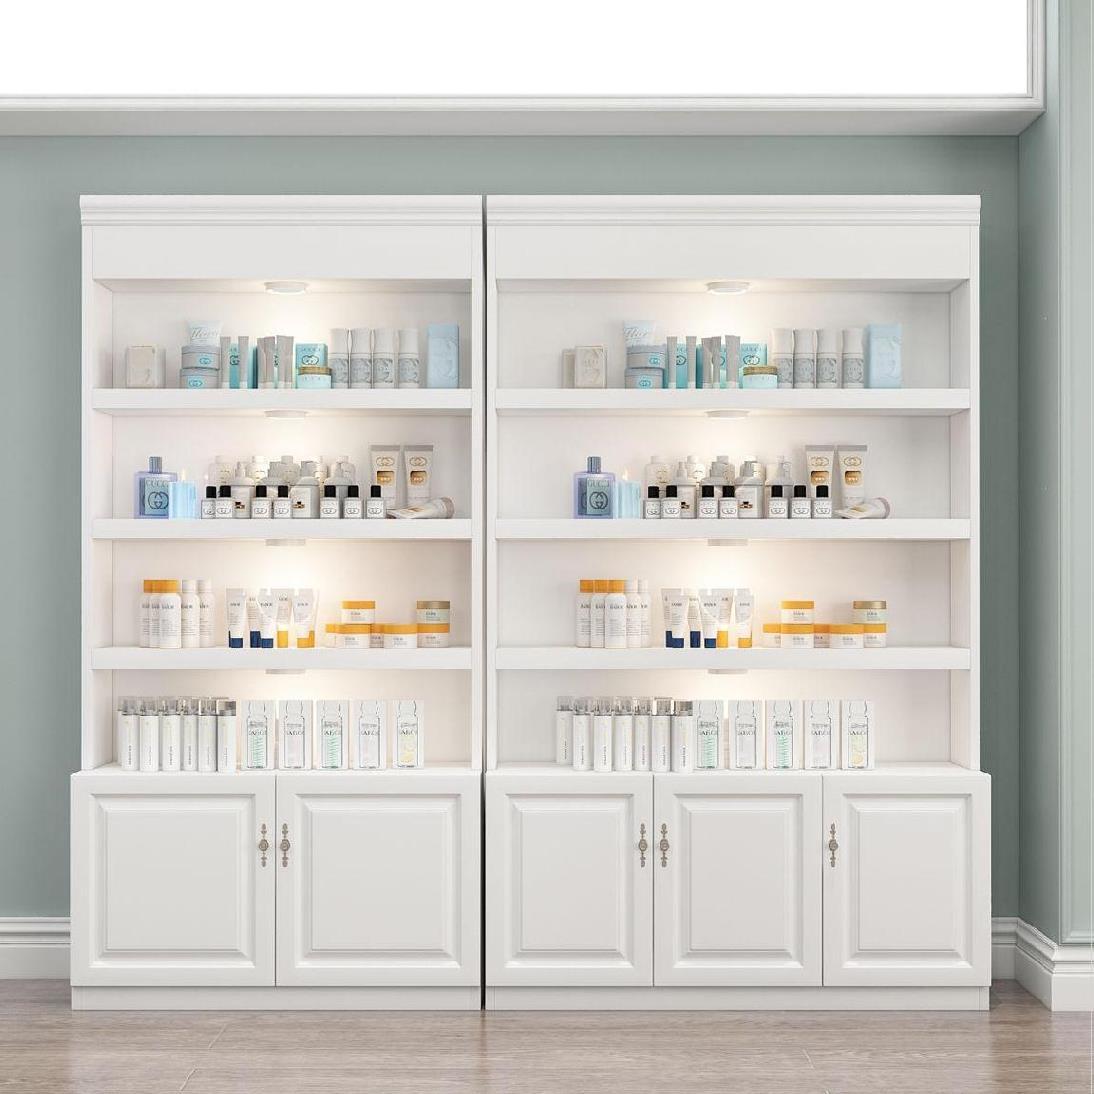 Мебель для супермаркетов / Аксессуары для супермаркетов Артикул 616425762946